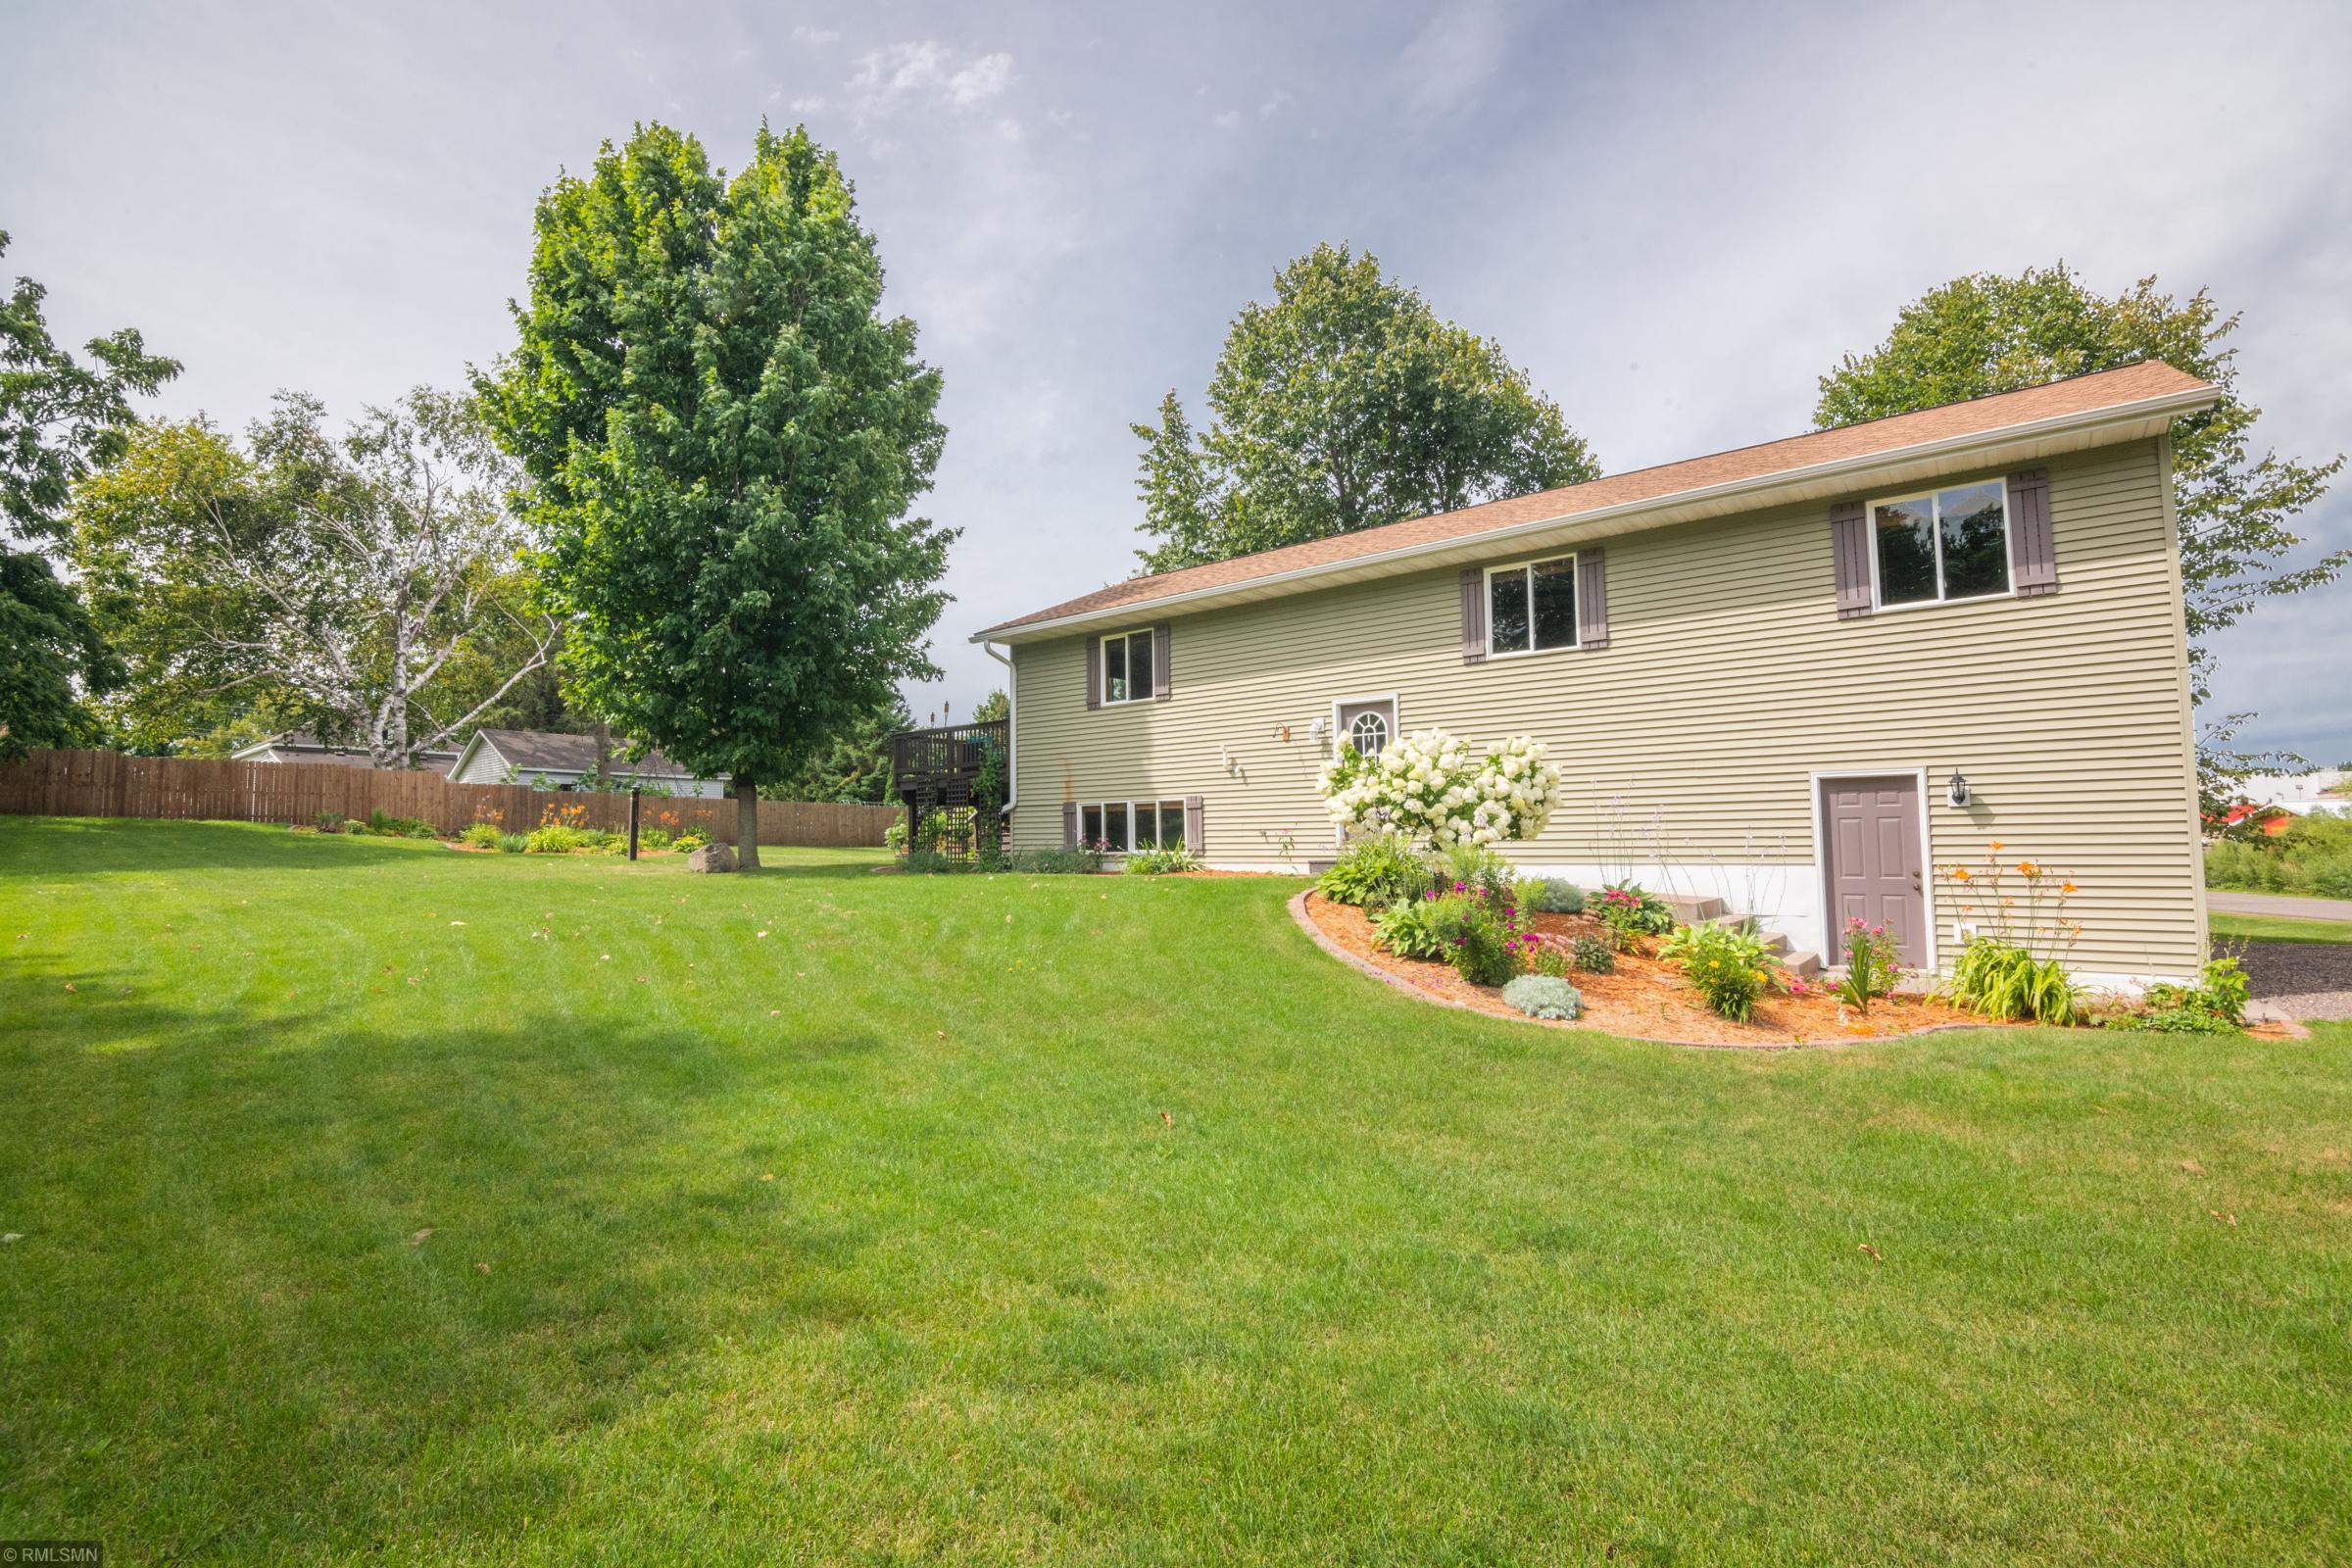 125 Ash Street Property Photo - Turtle Lake, WI real estate listing